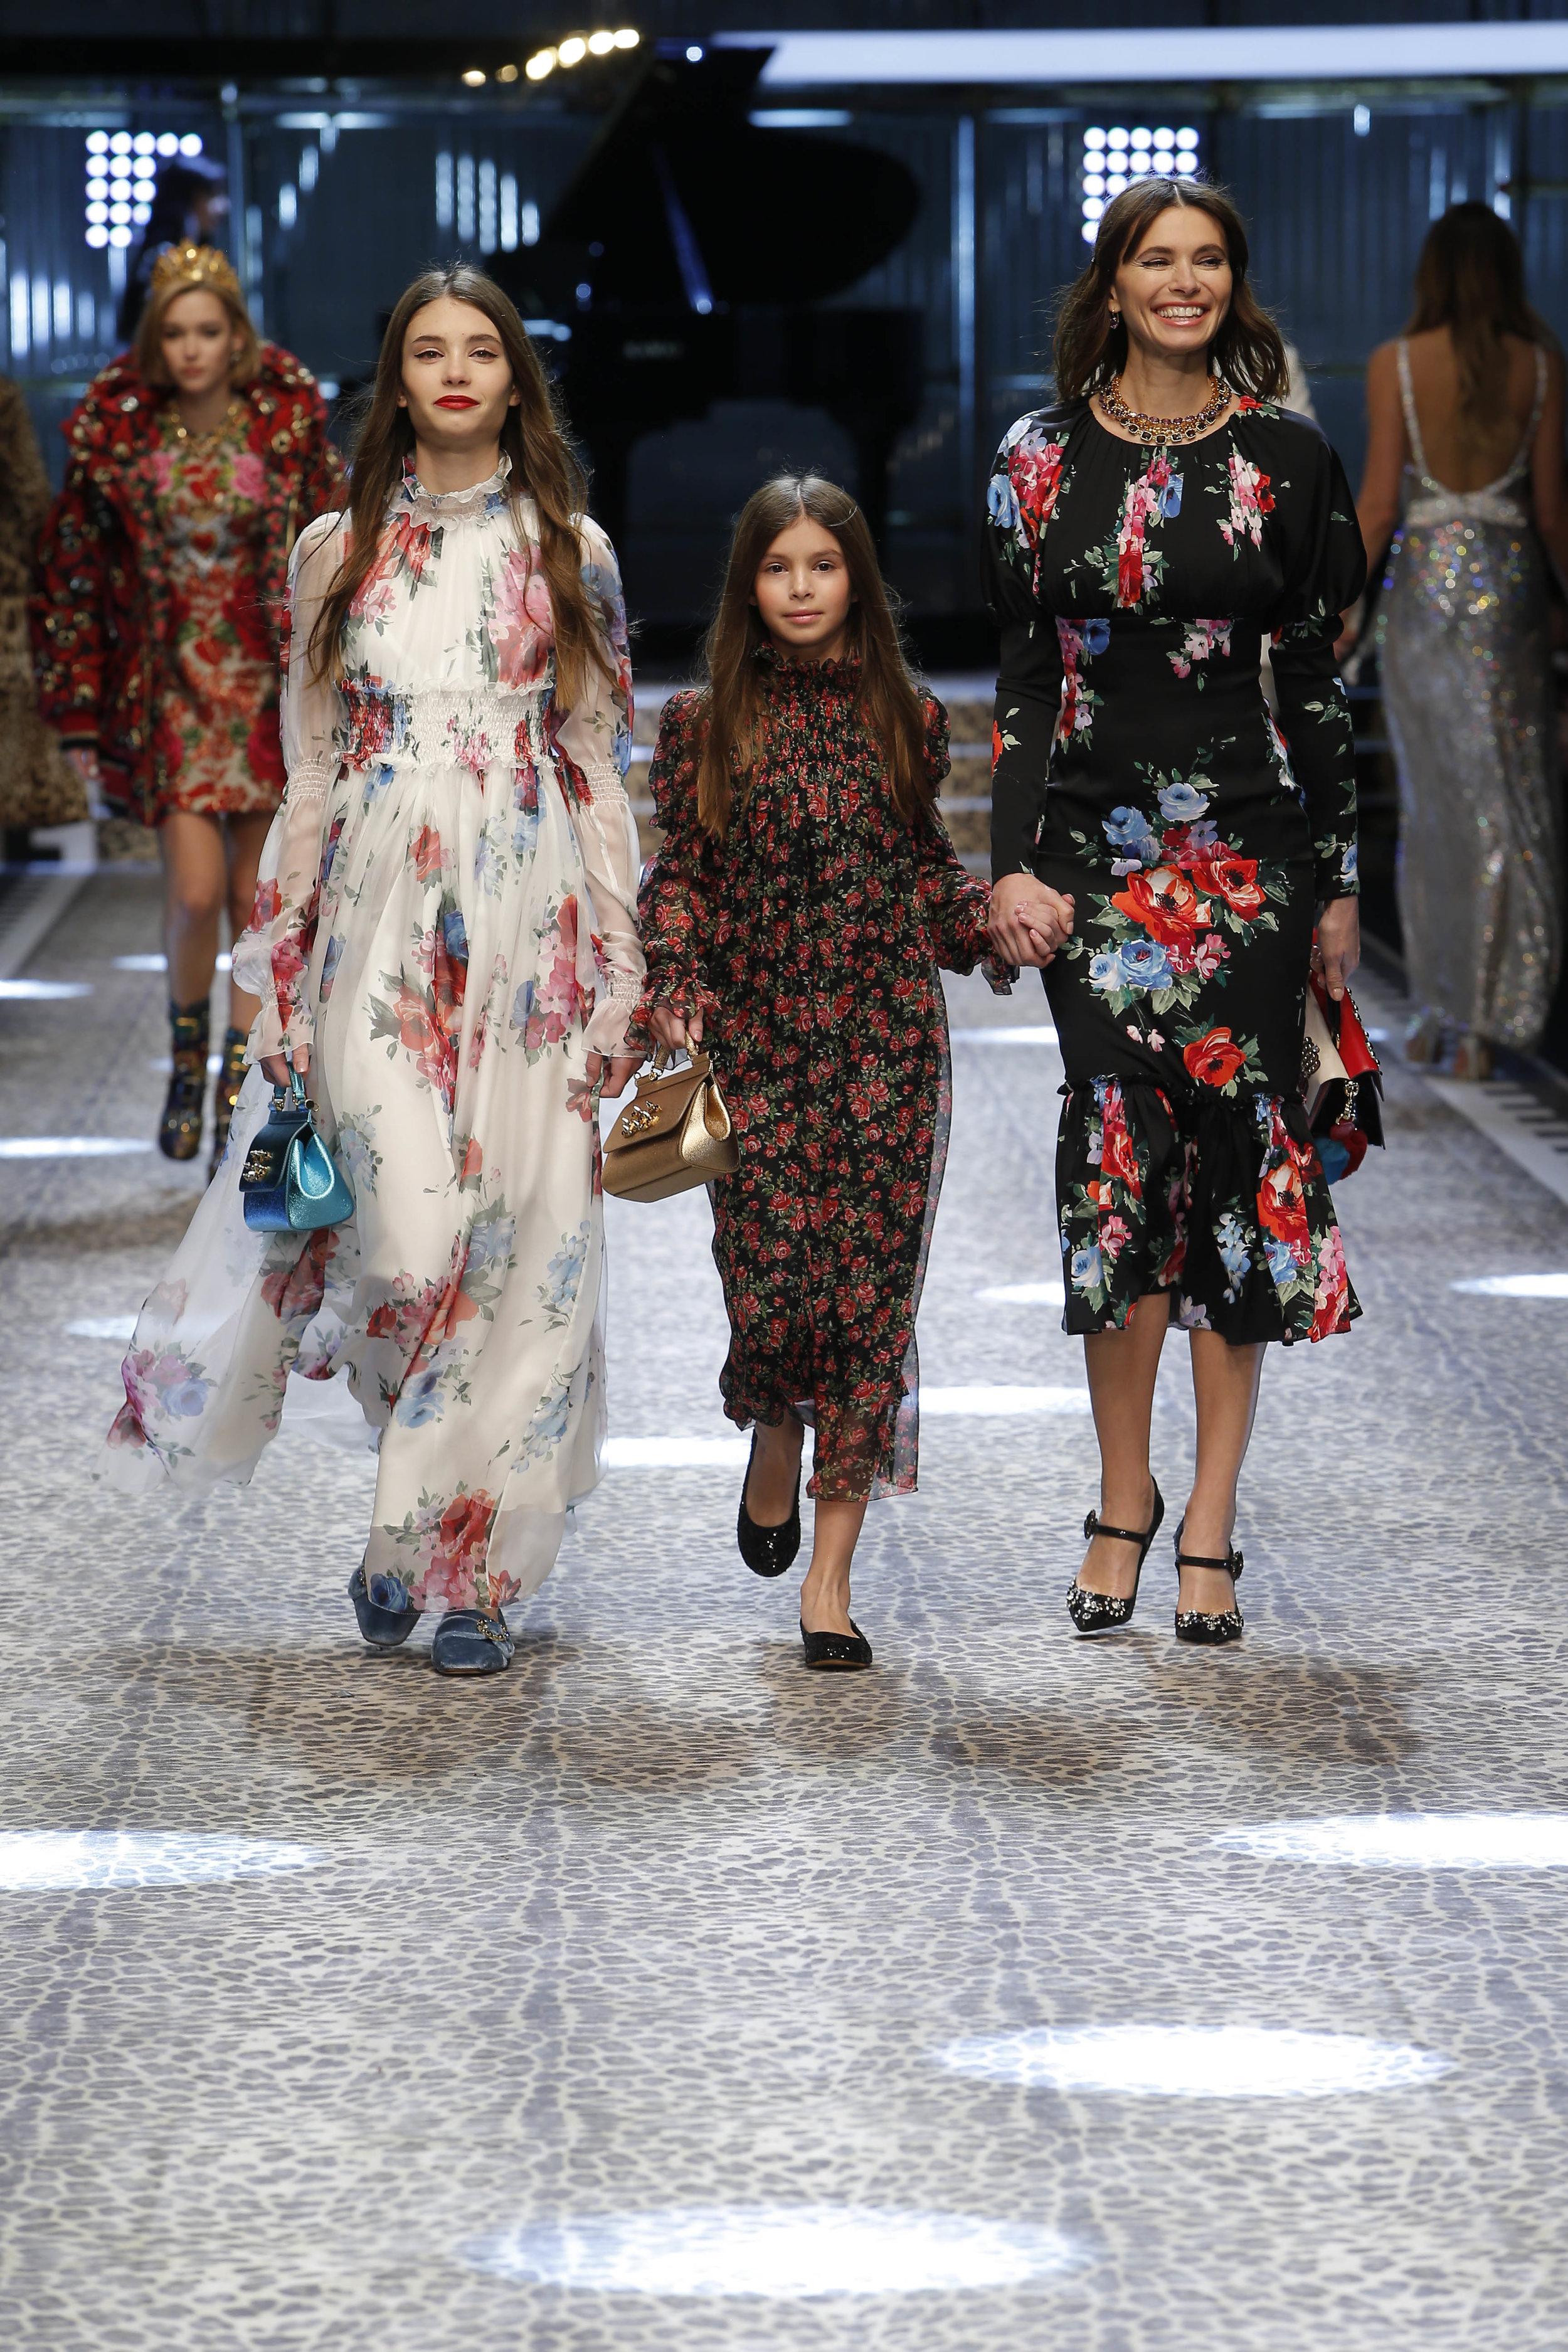 Dolce&Gabbana_women's fashion show fw17-18_Runway_images (93).jpg